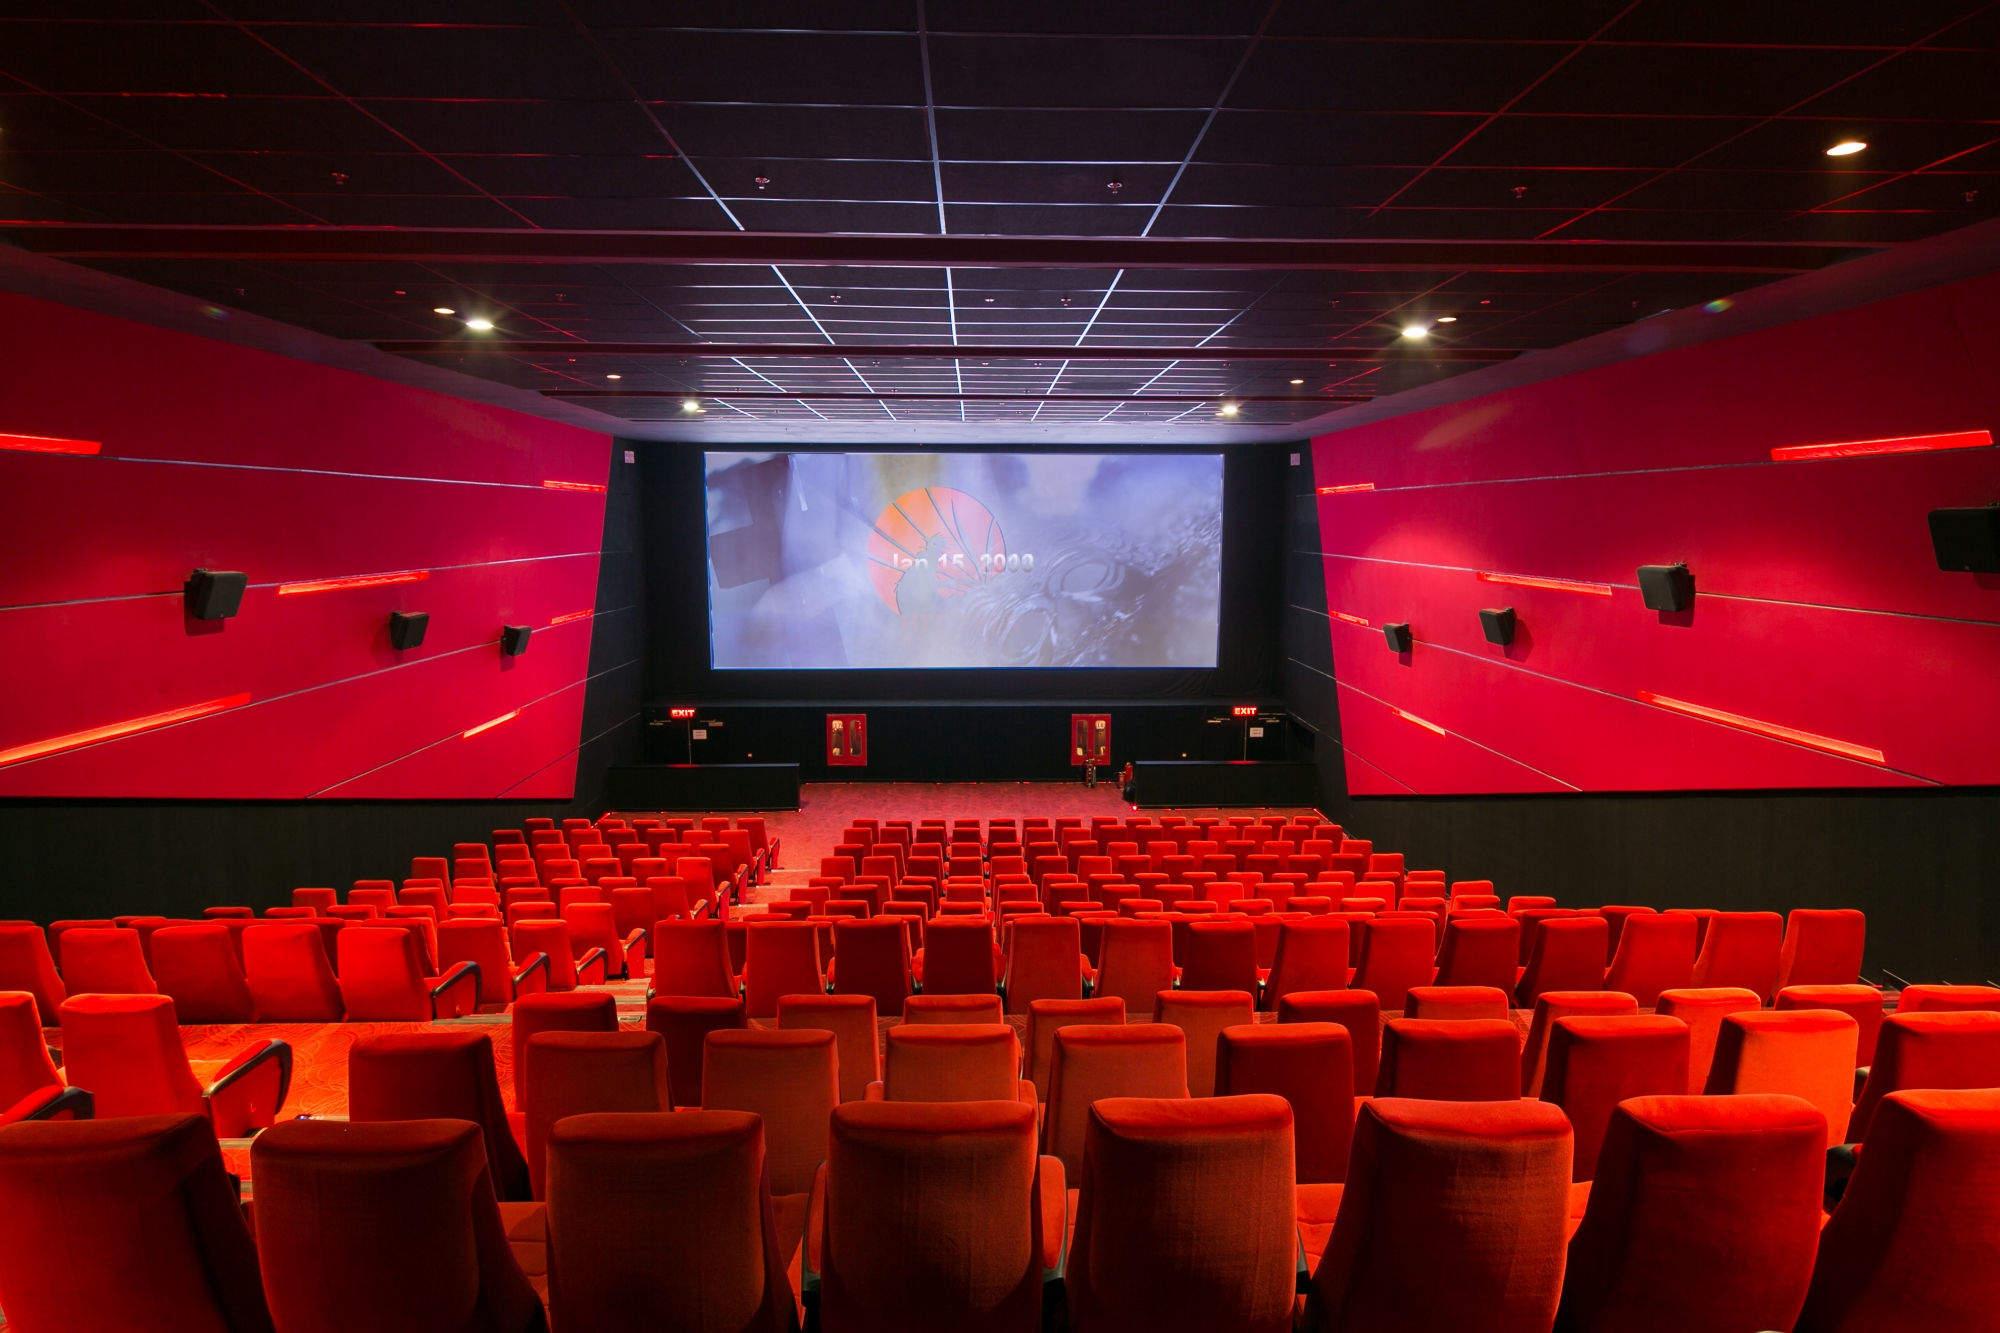 Now, breathe clean air at PVR Cinemas